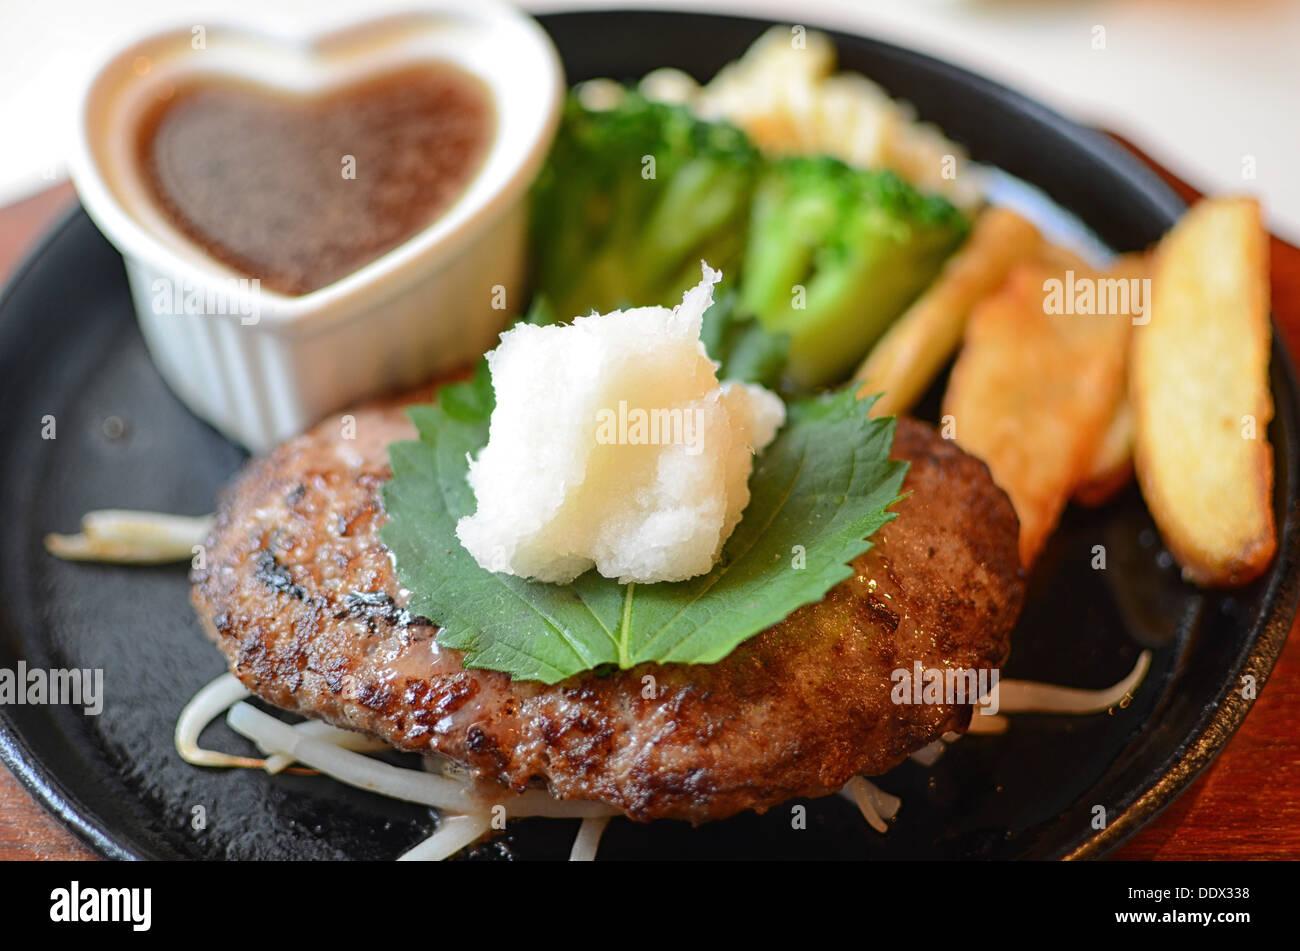 A hamburger Japanese style (hamburg). On top is grated Japanese radish. - Stock Image